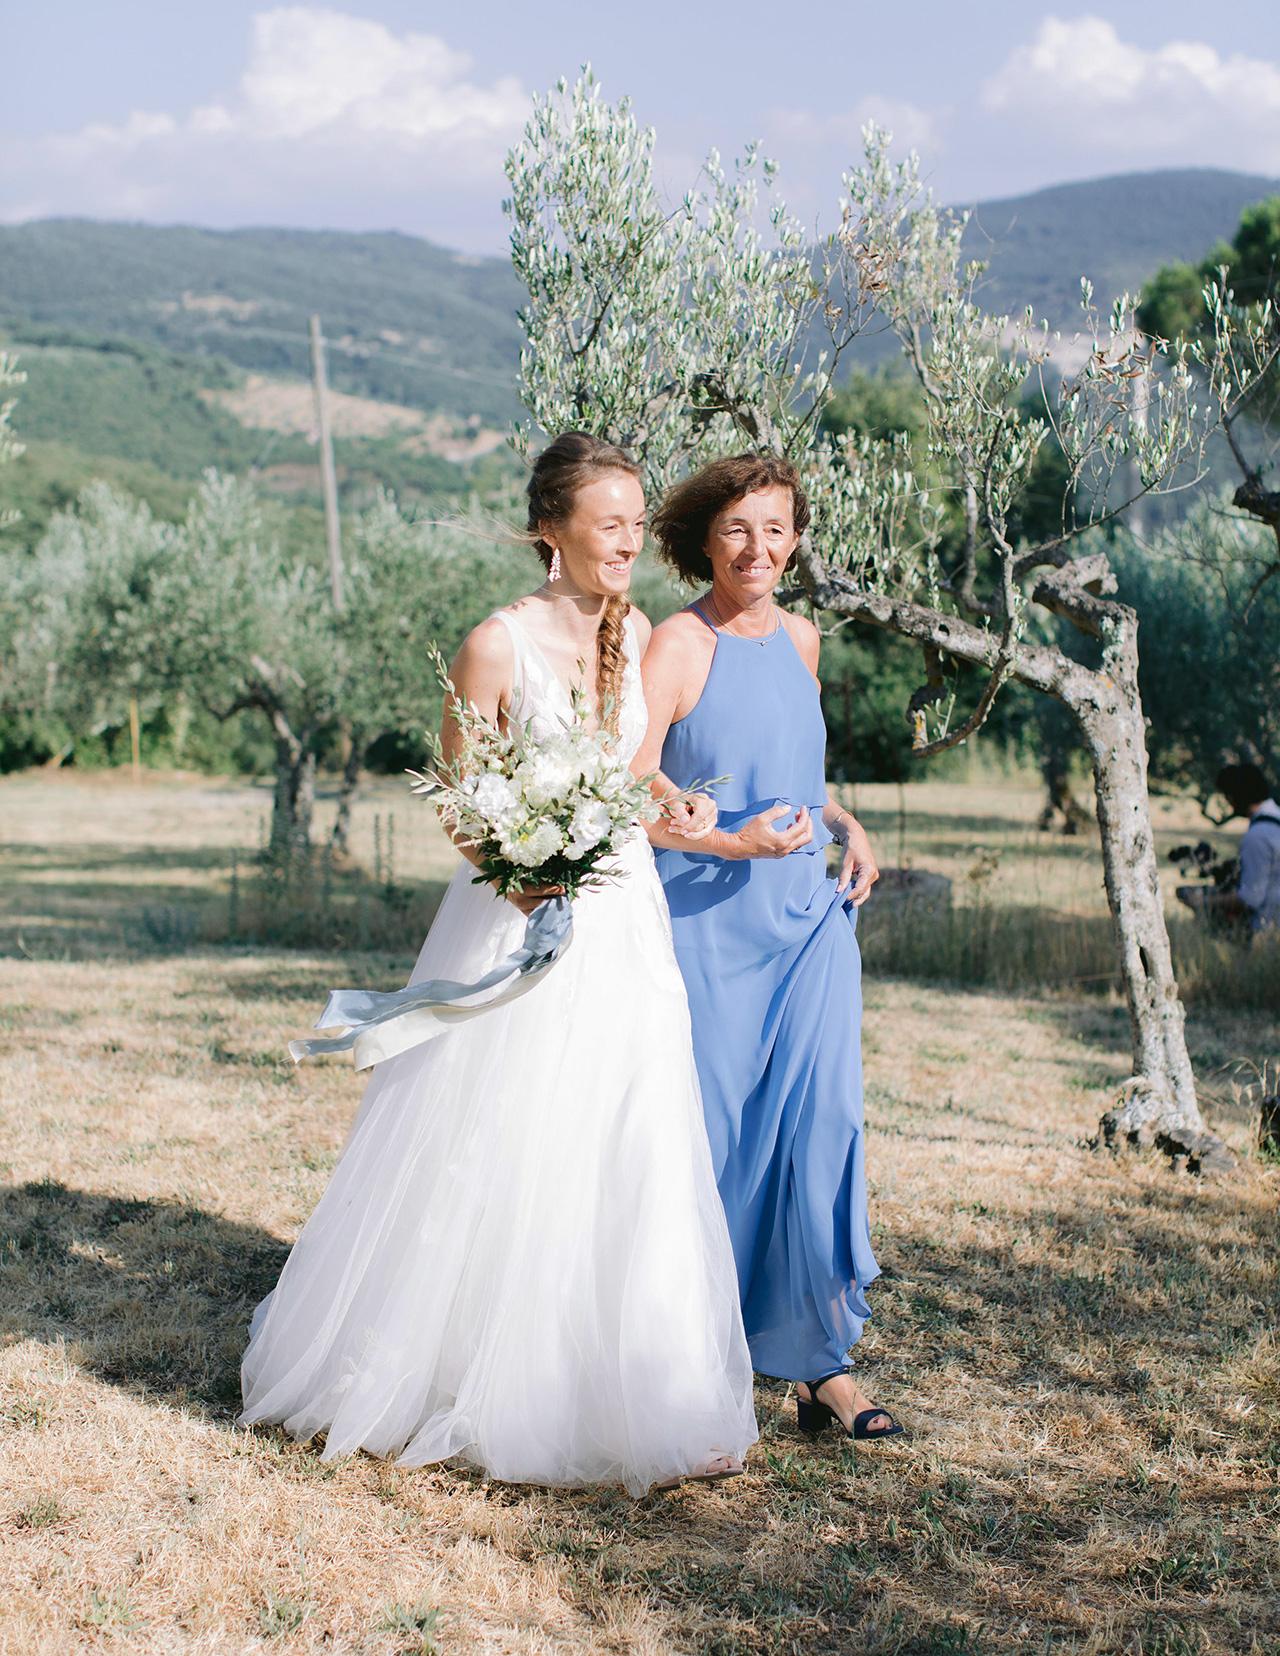 bride mother wedding day outdoor walk